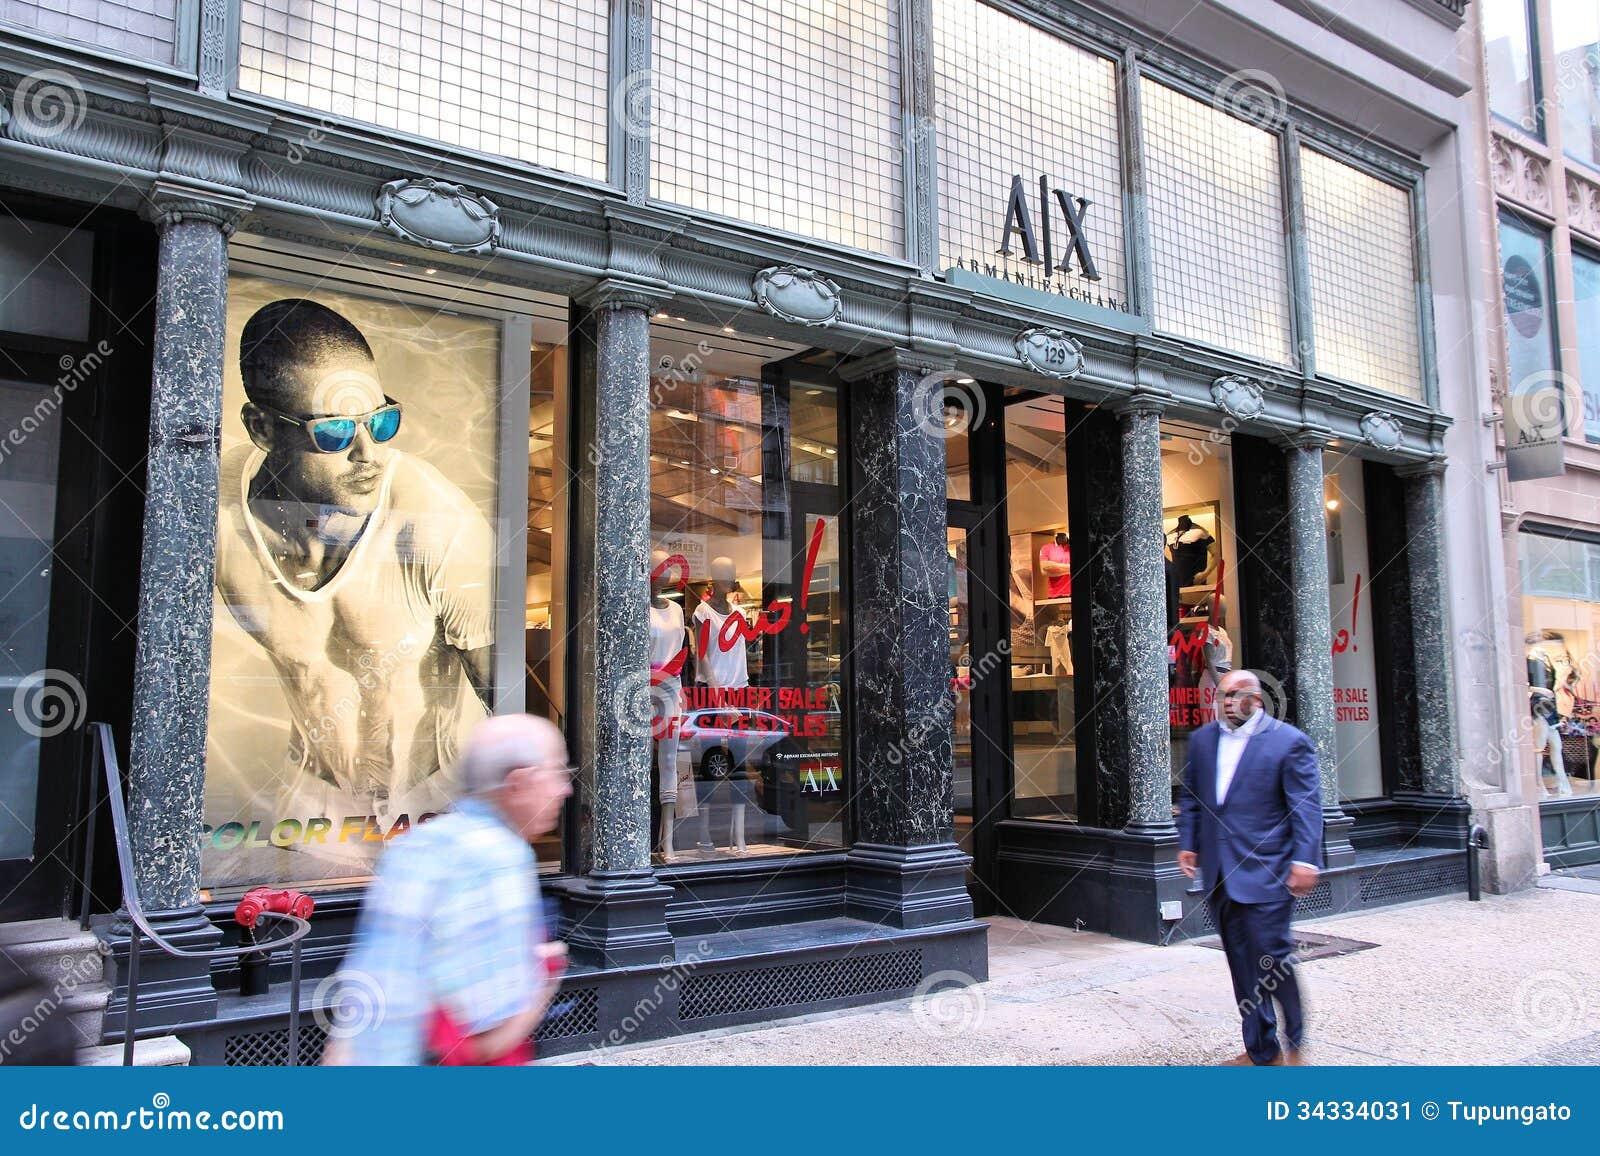 Armani Exchange Store Editorial Photo - Image: 34334031